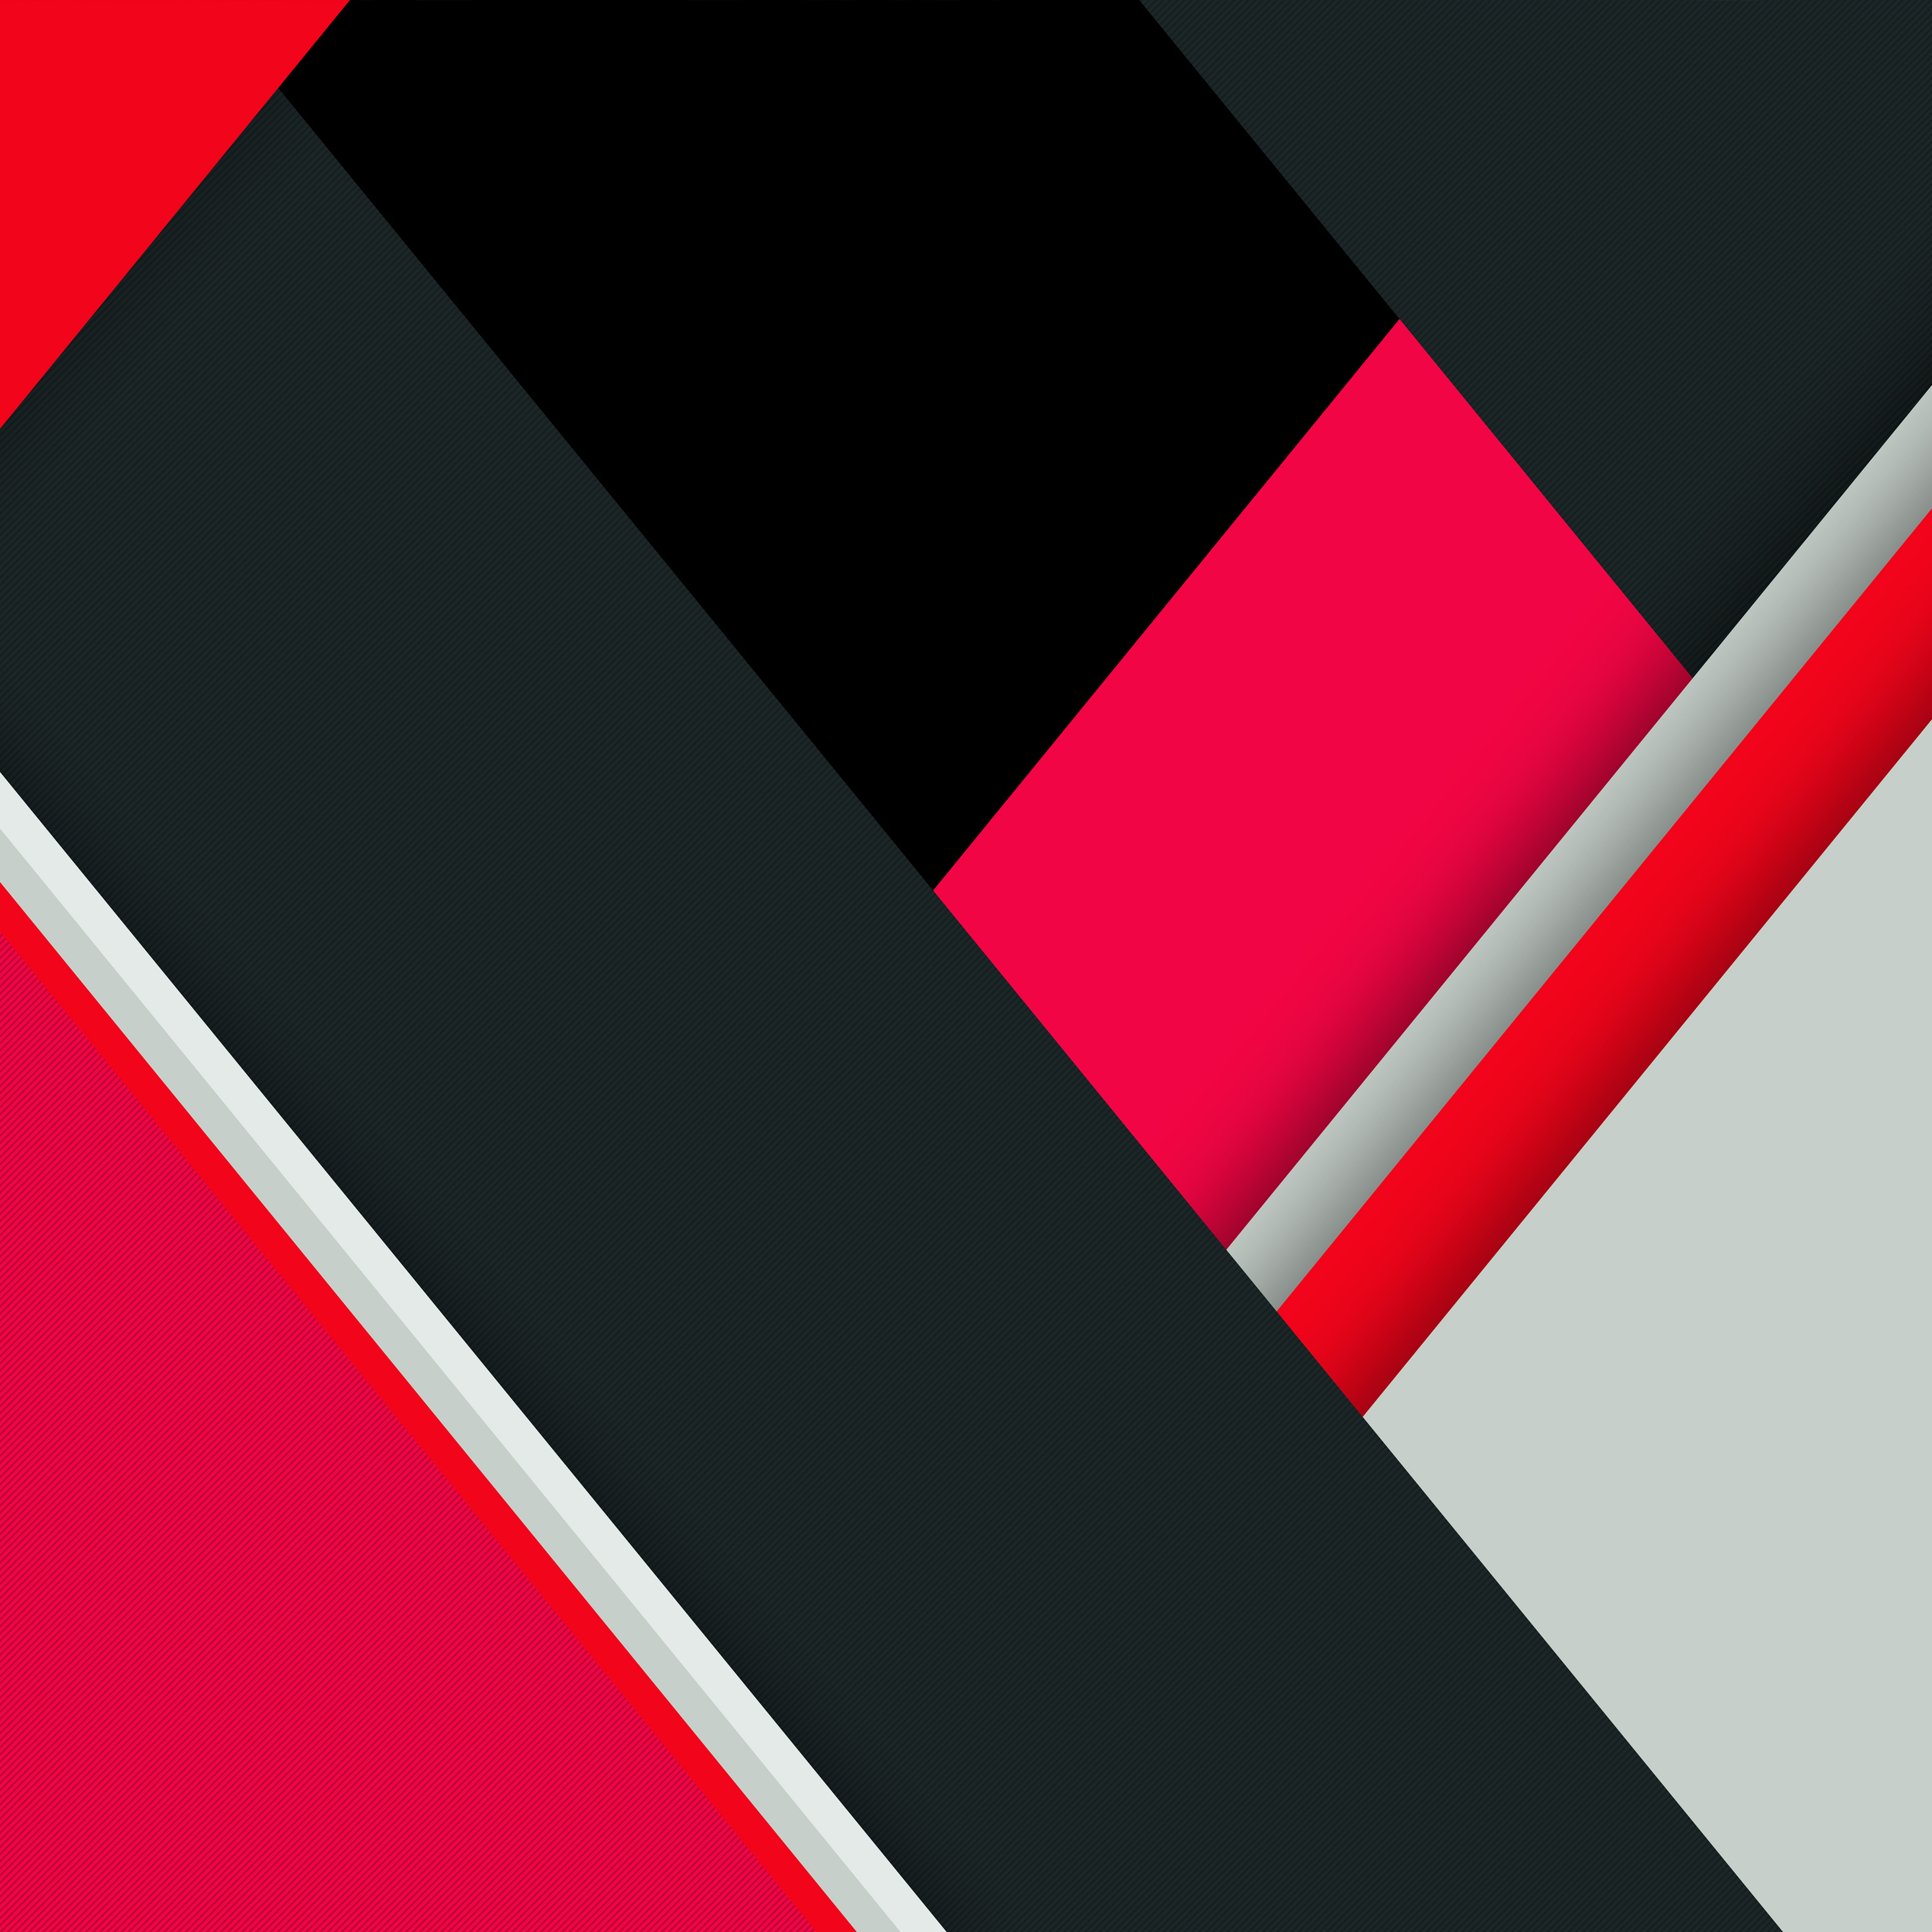 2932x2932 Red Black Minimal Abstract 8k Ipad Pro Retina